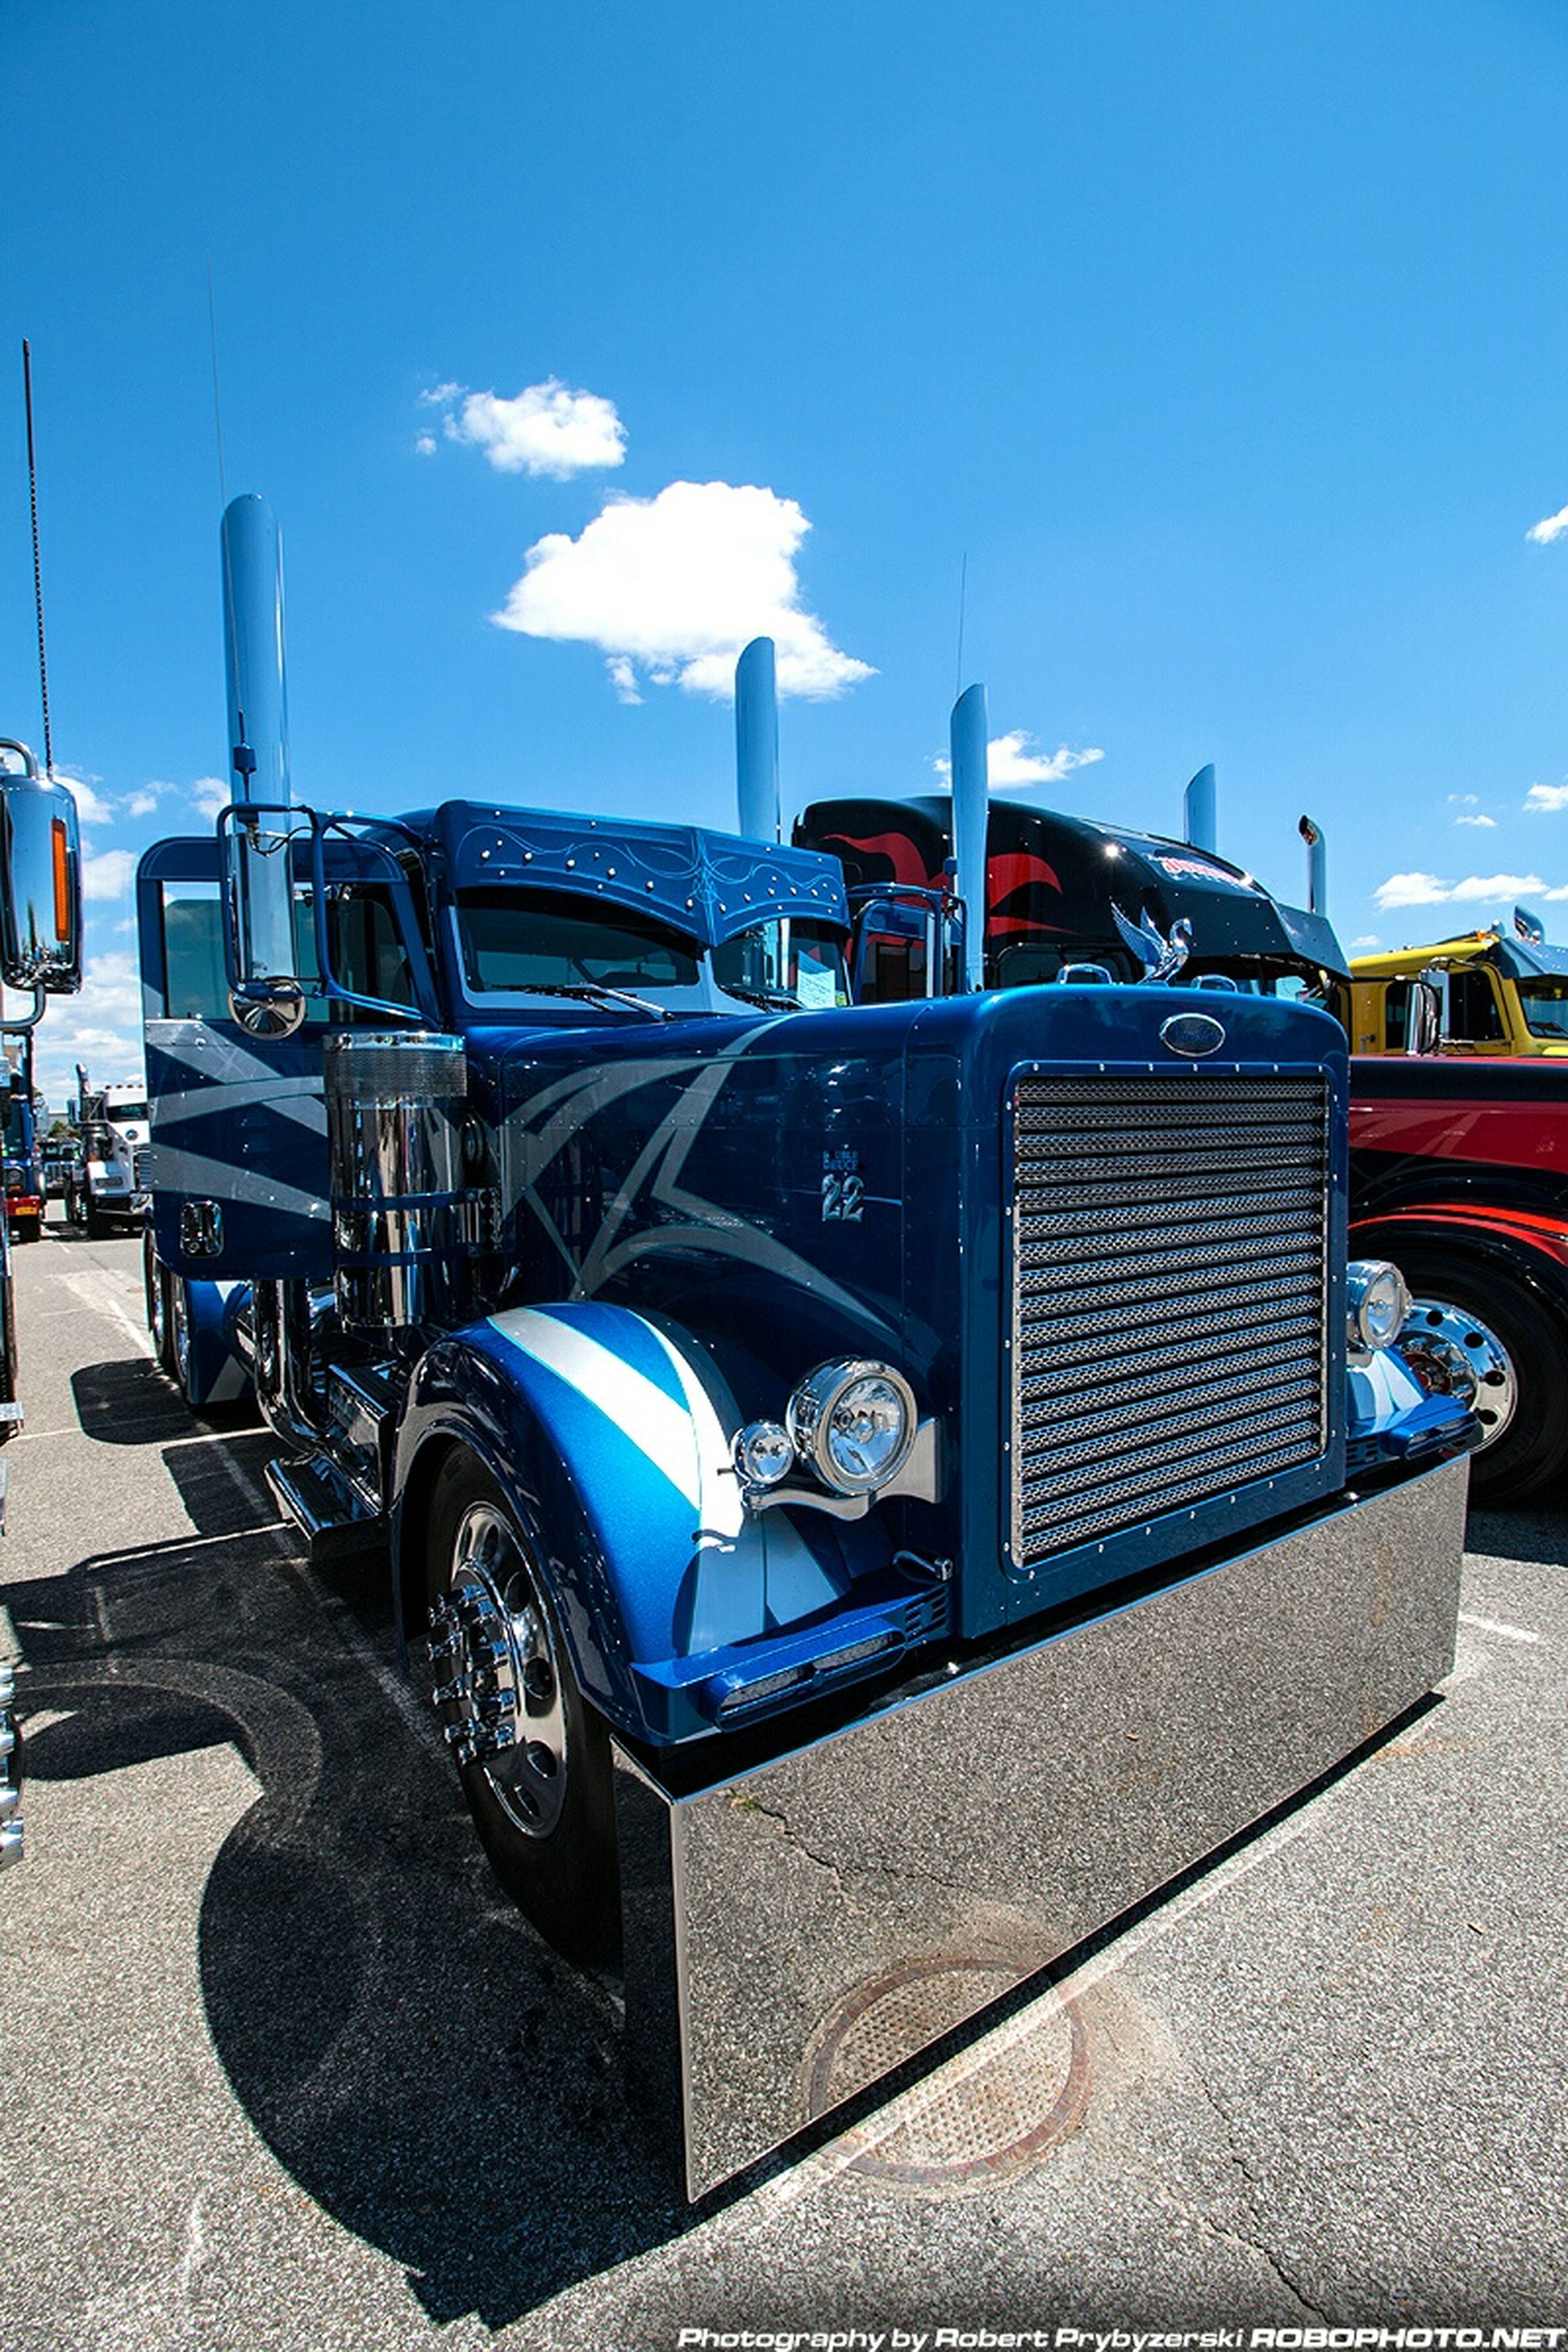 One Stop Customs Truck Show, Blueprint Peterbilt Trucking Custom Trucks Taking Photos